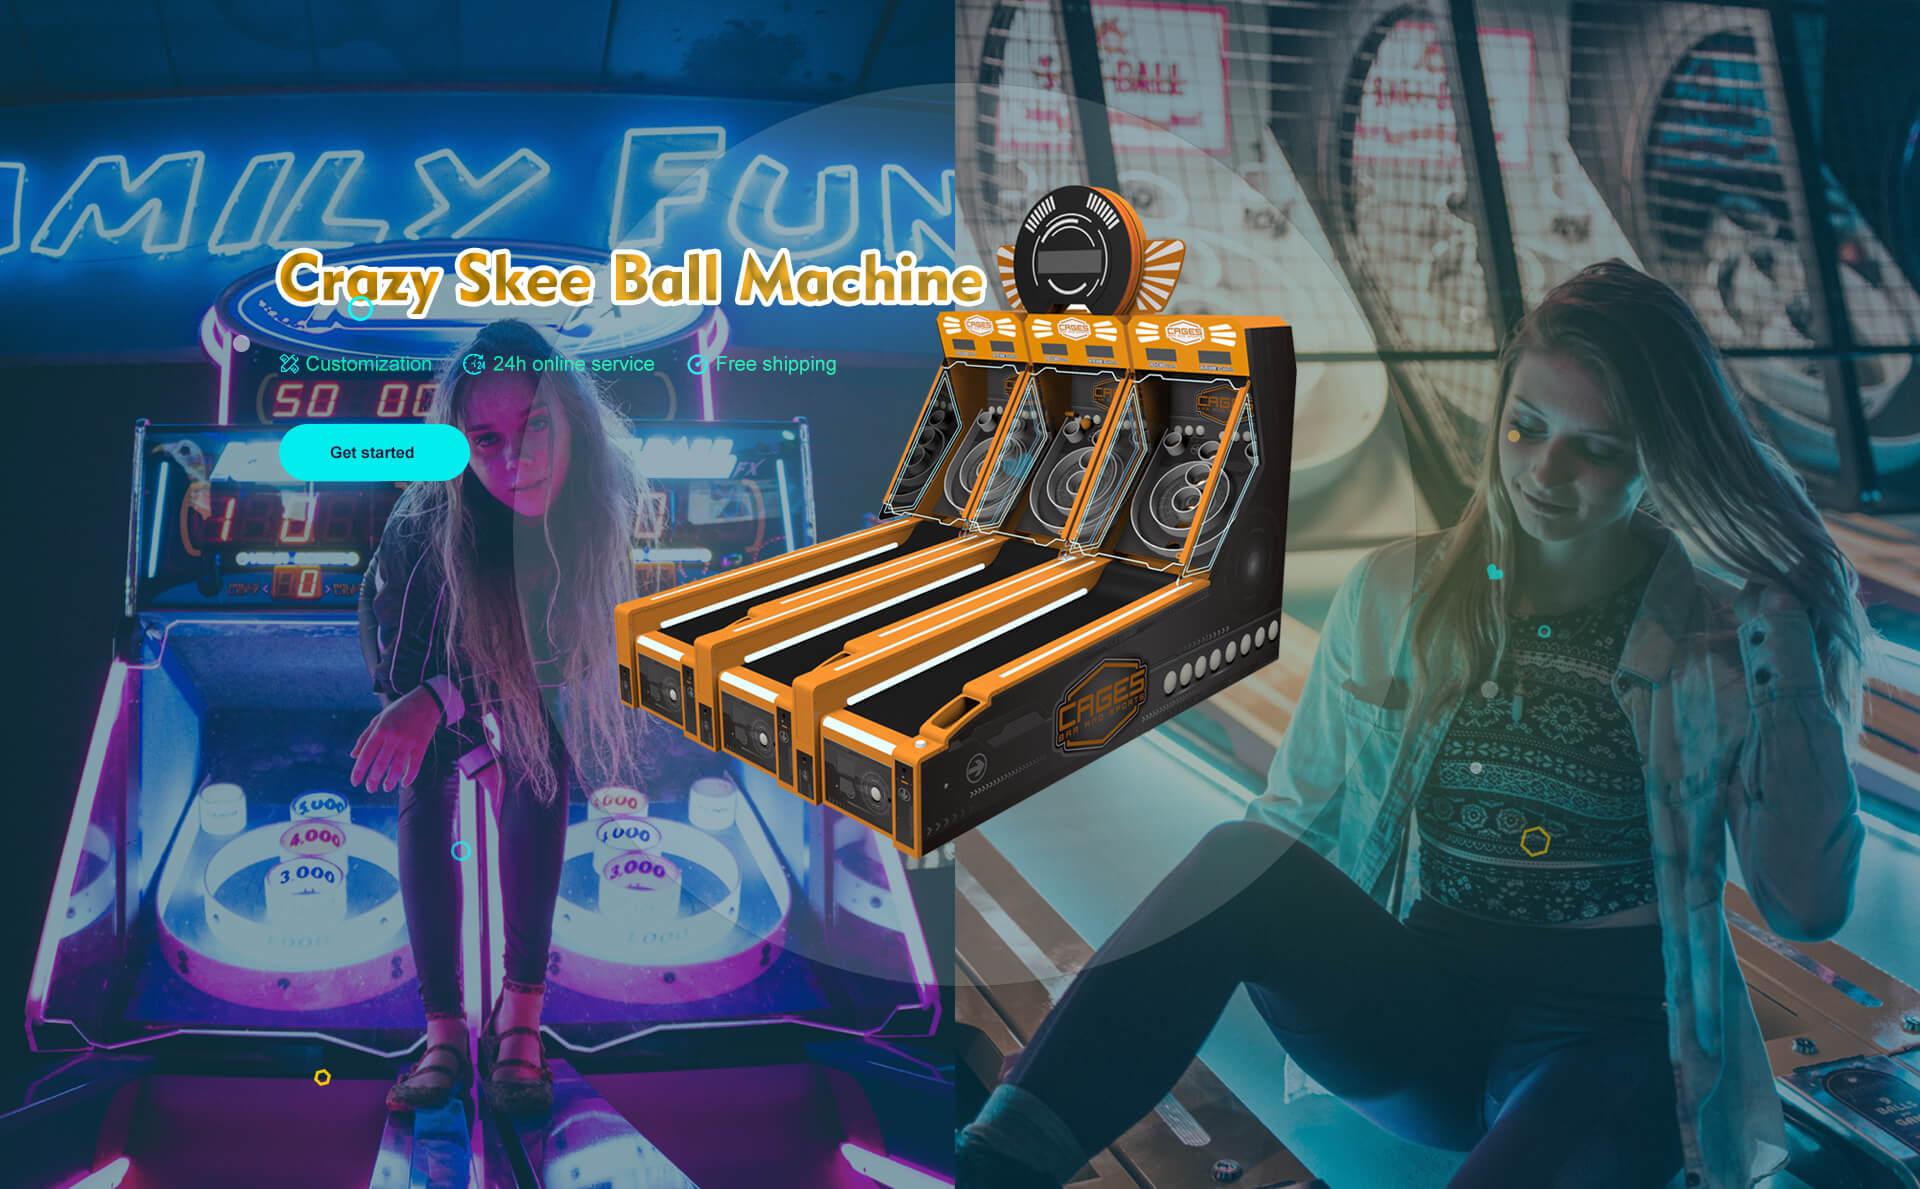 Crazy Skee Ball Machine